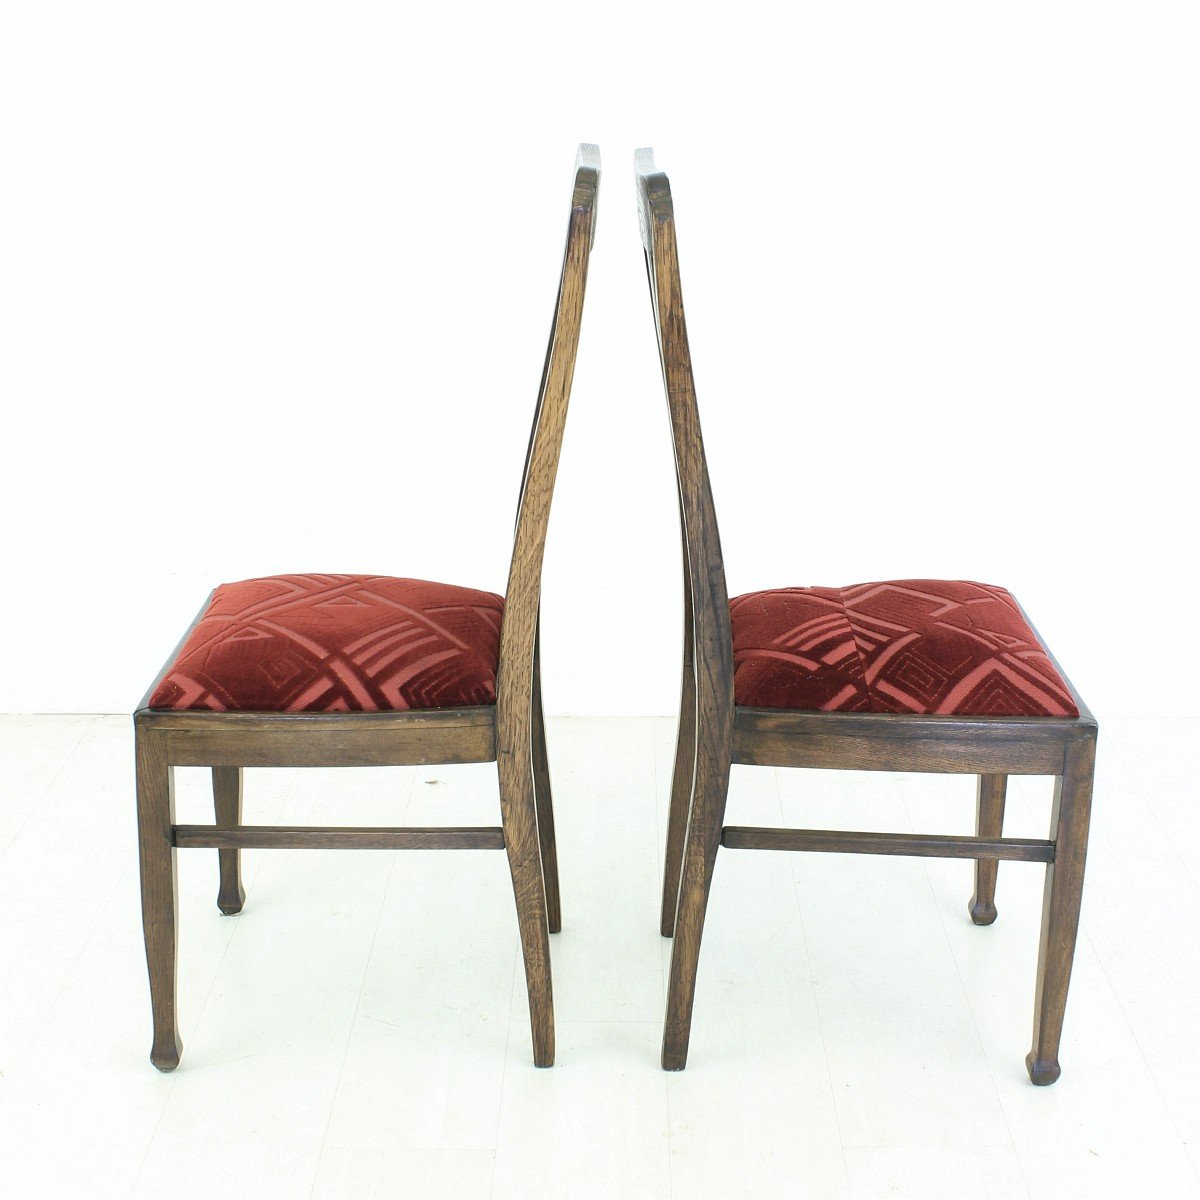 vintage oak dining chairs 1920s set of 2 for sale at pamono. Black Bedroom Furniture Sets. Home Design Ideas